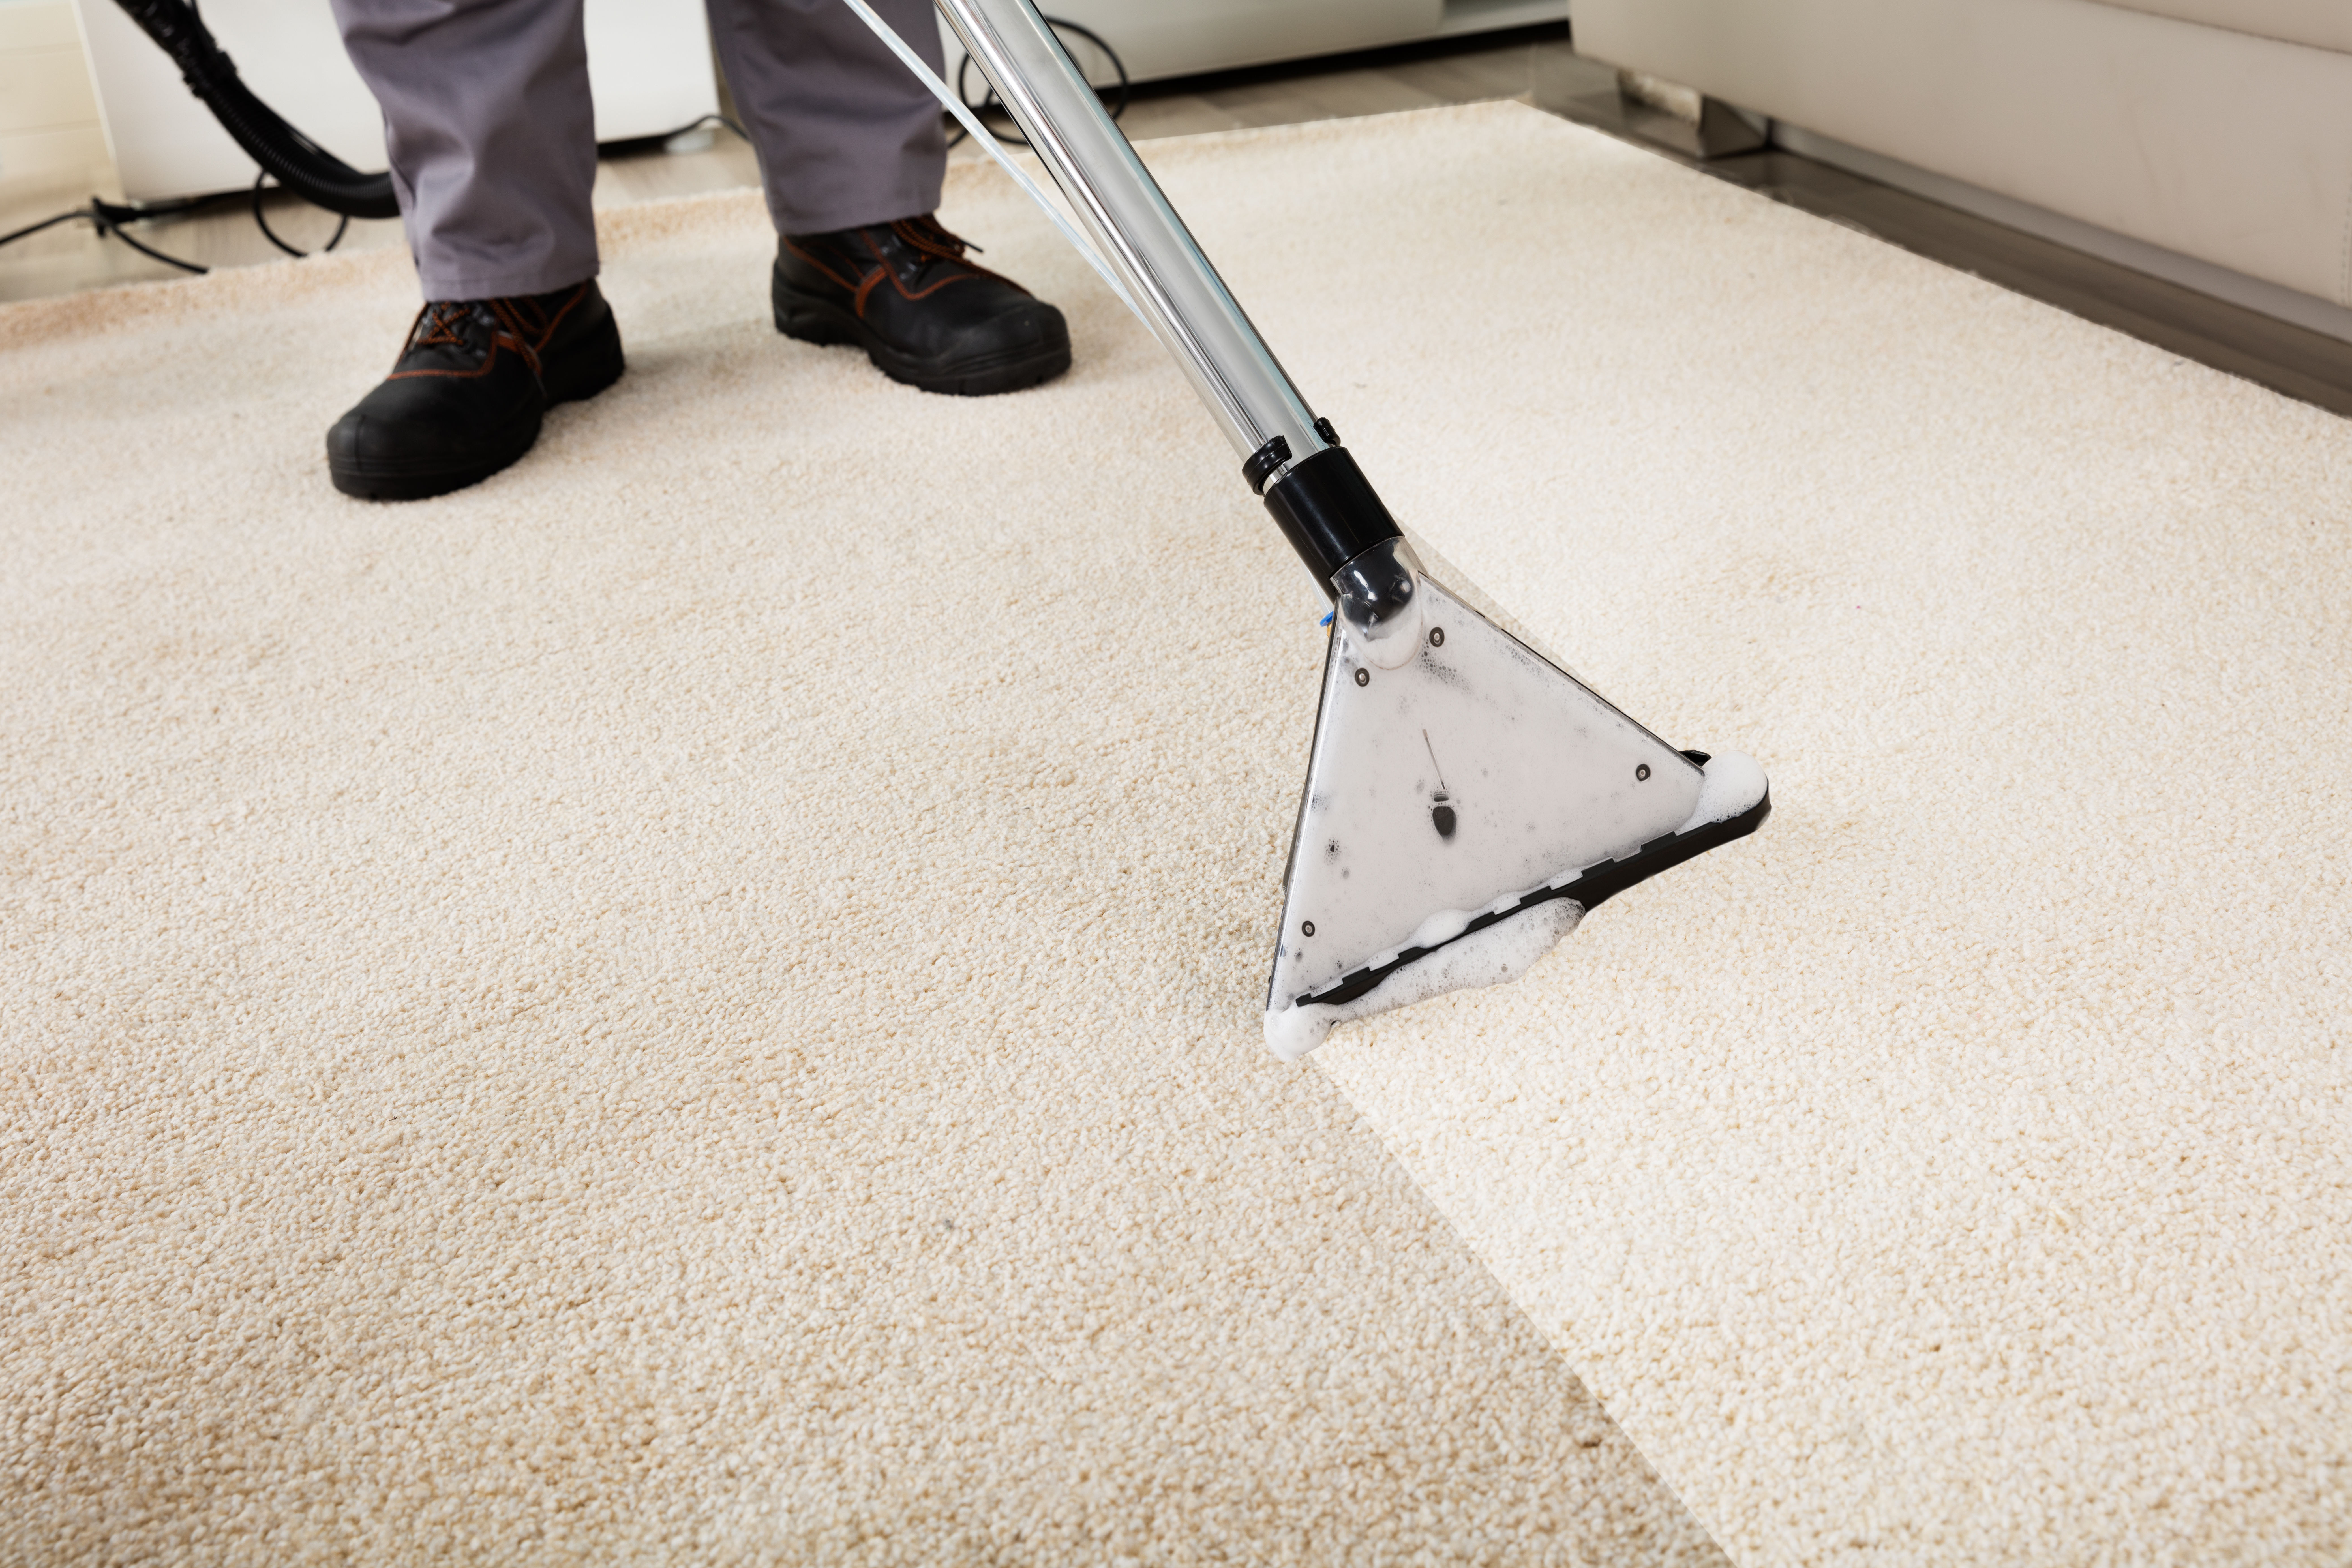 tristate carpet cleaning auburn angola indiana